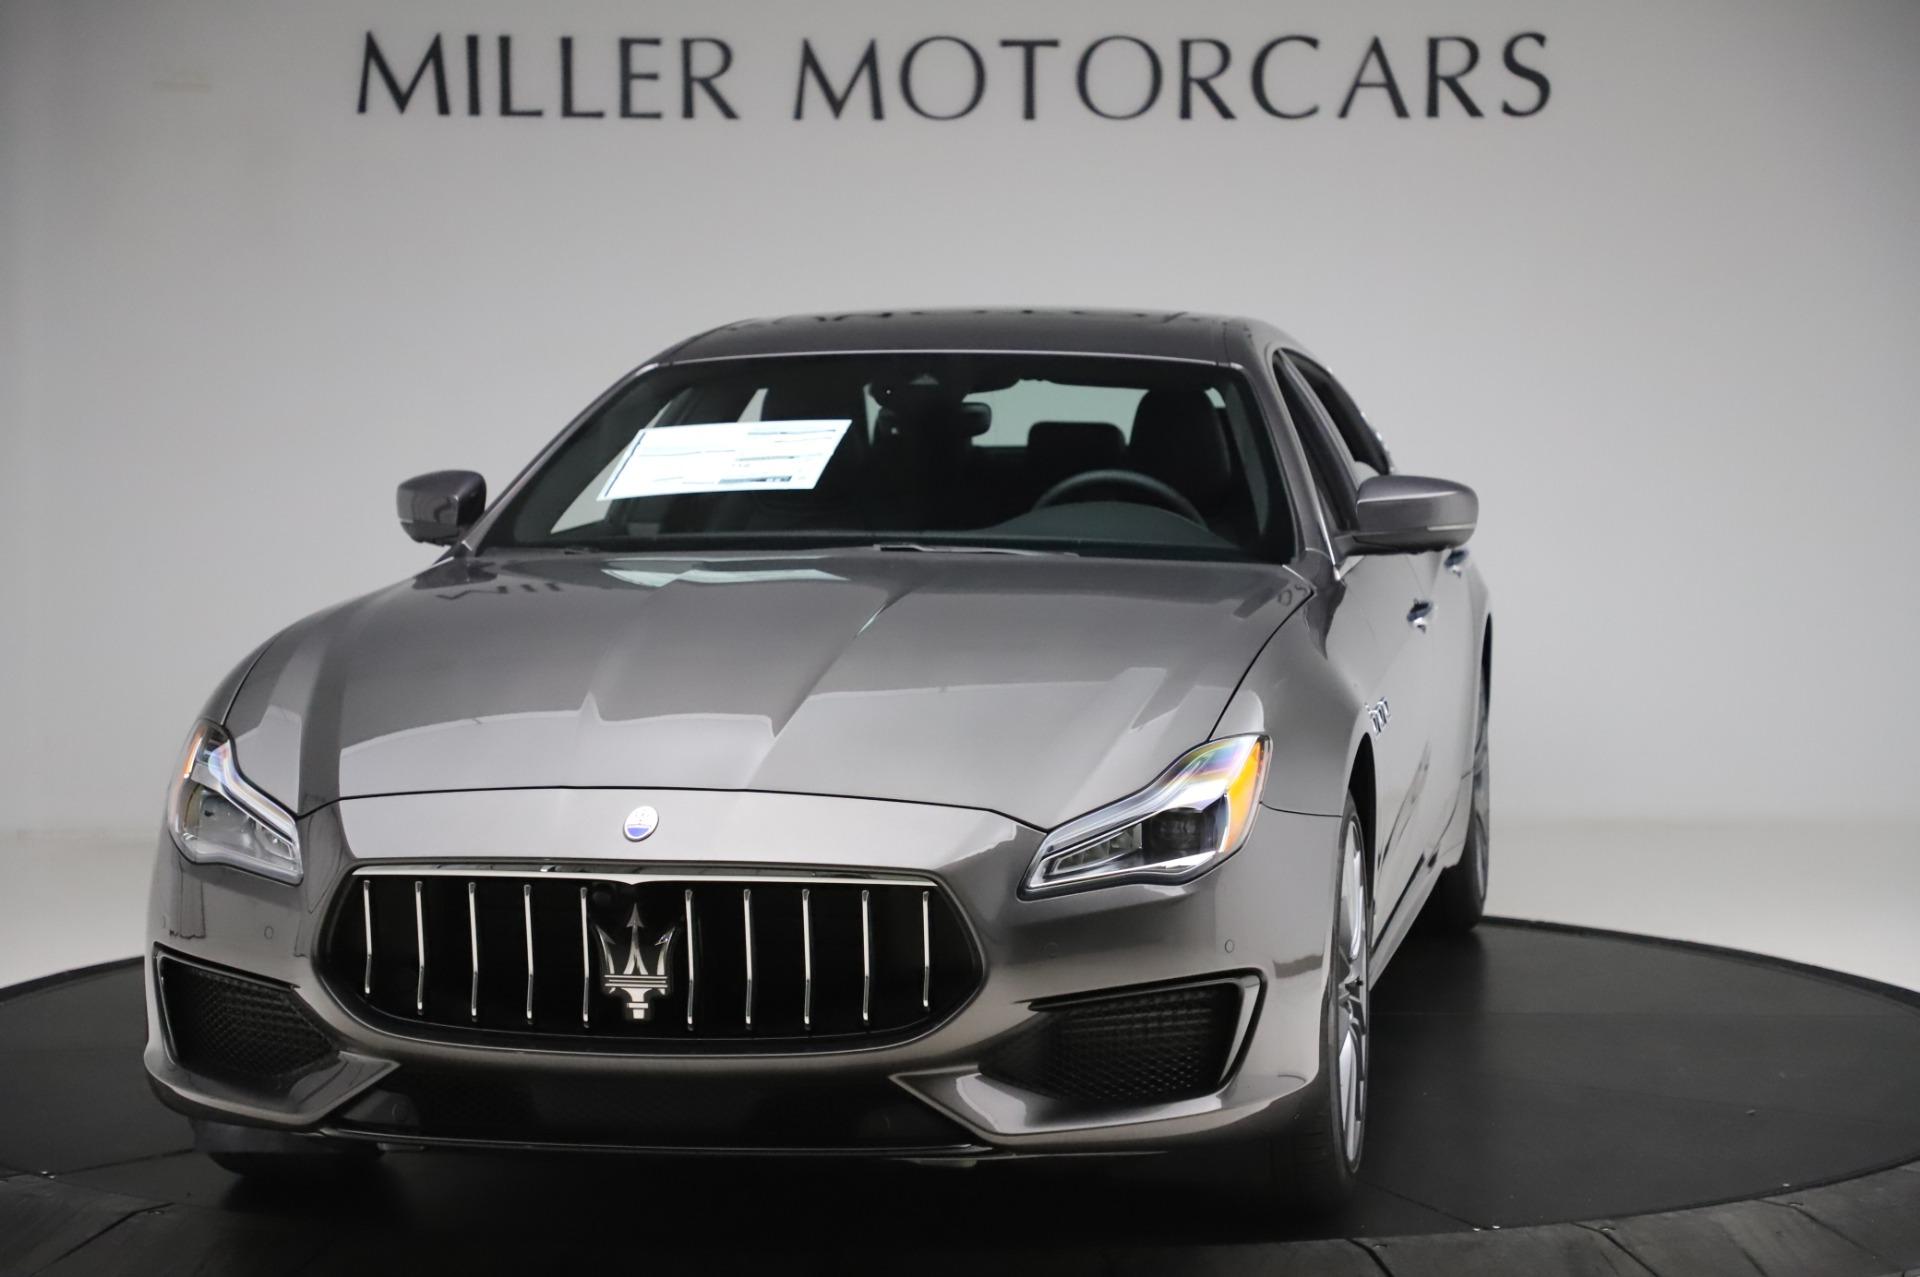 New 2020 Maserati Quattroporte S Q4 GranSport for sale $125,085 at Bentley Greenwich in Greenwich CT 06830 1